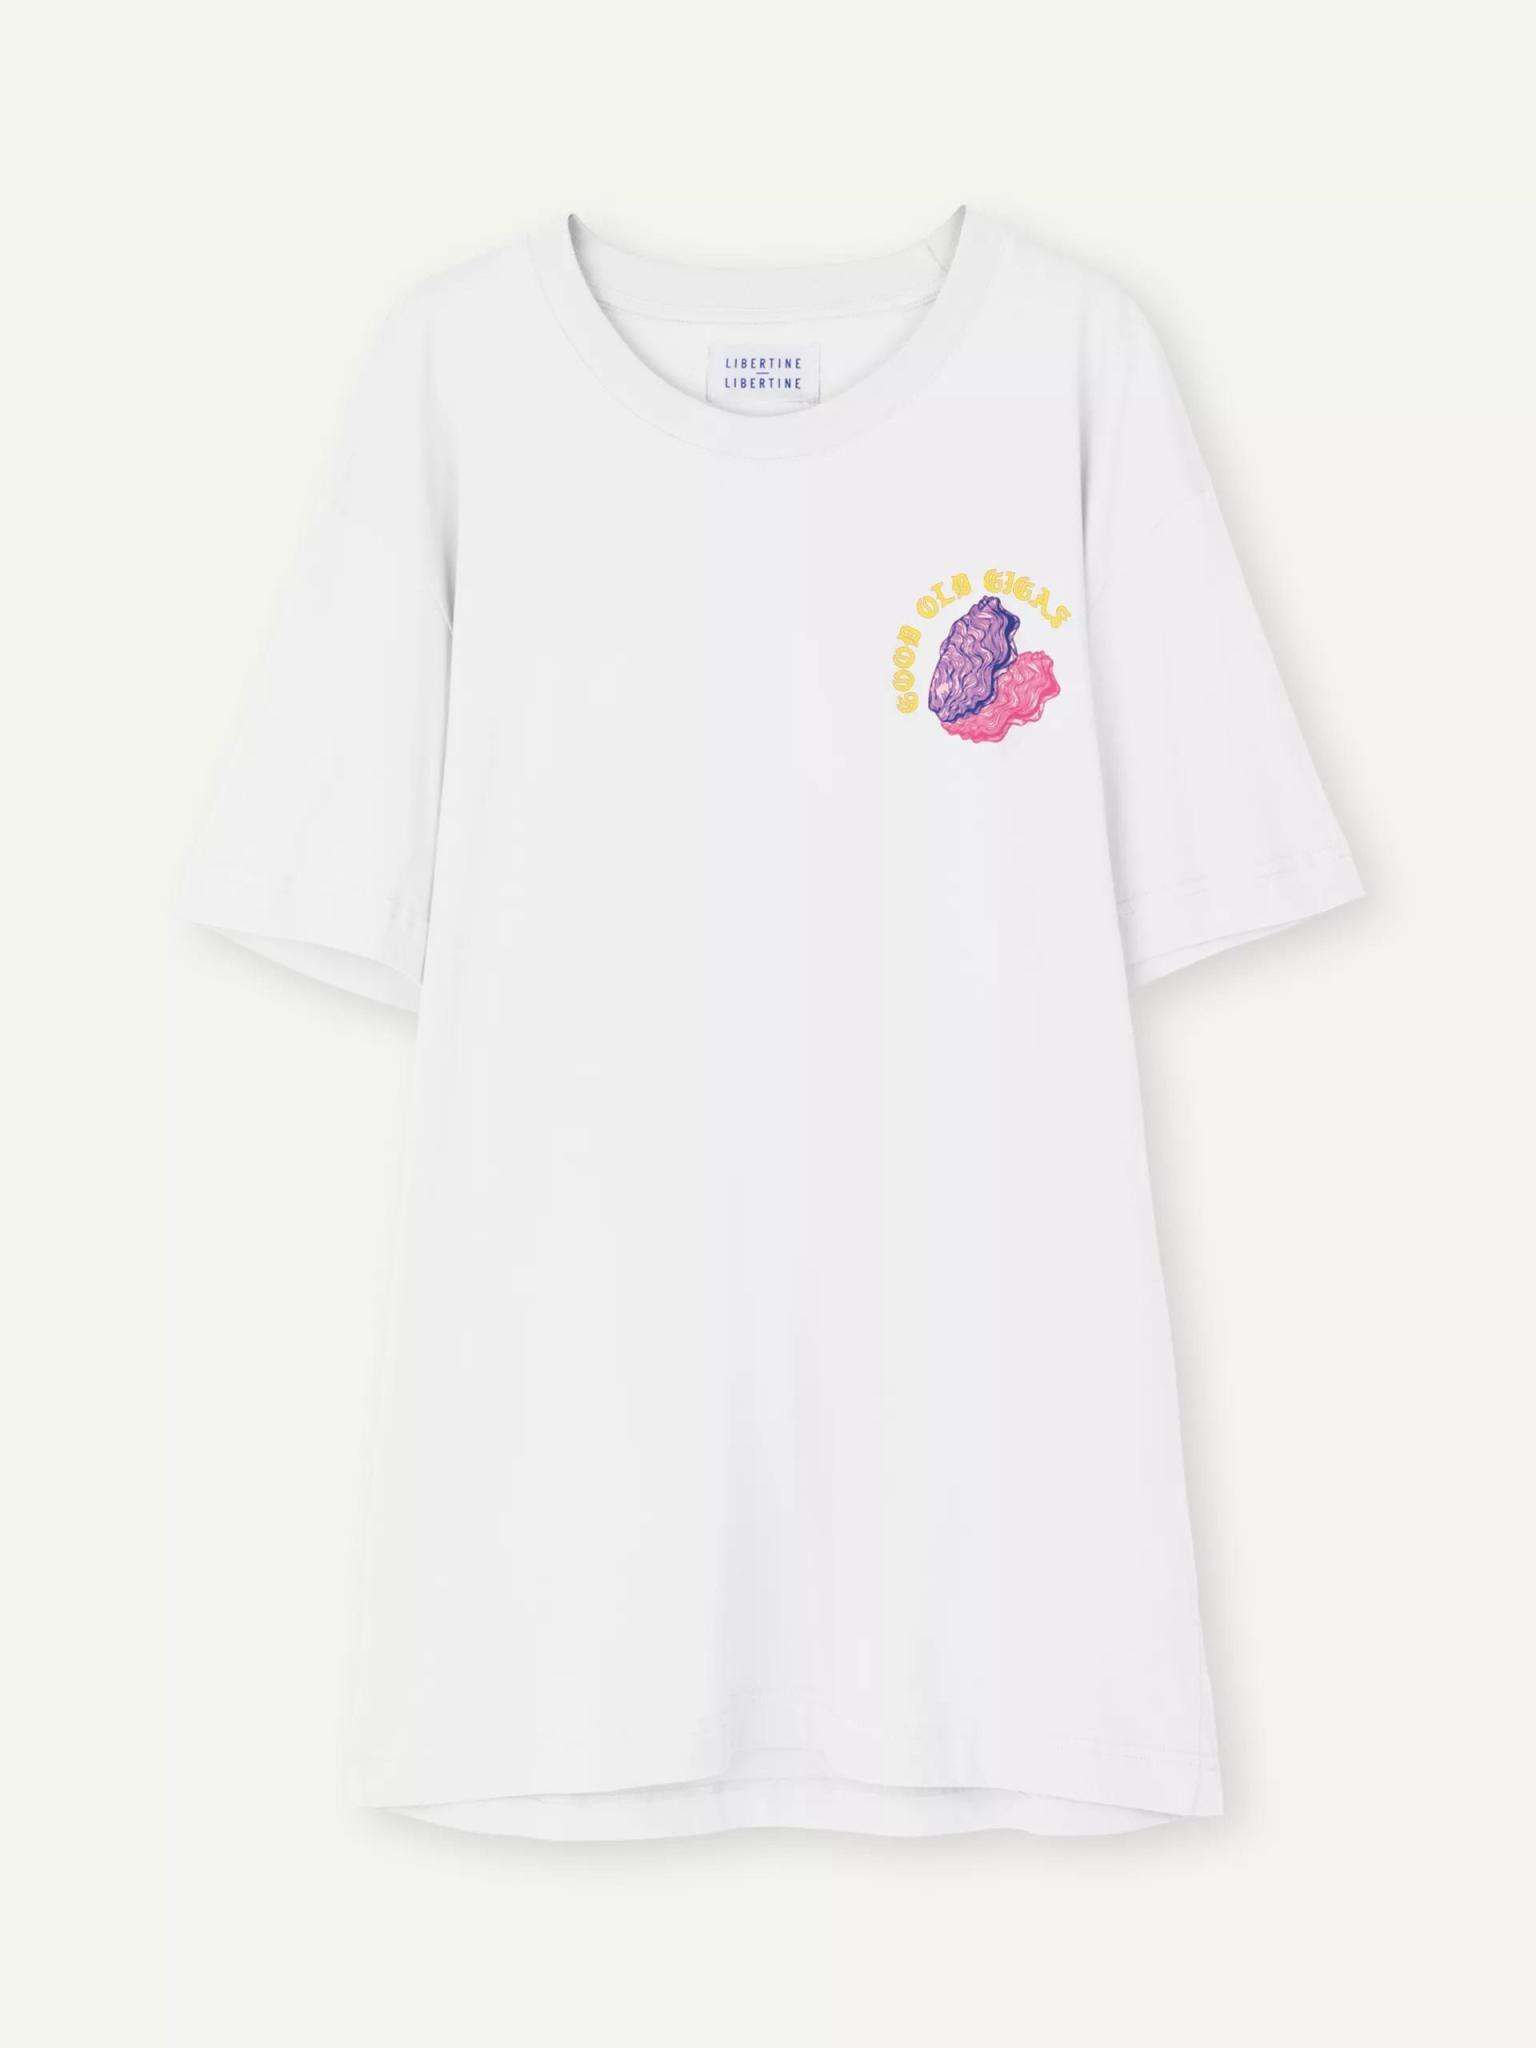 Beat Gigas T-Shirt White-1